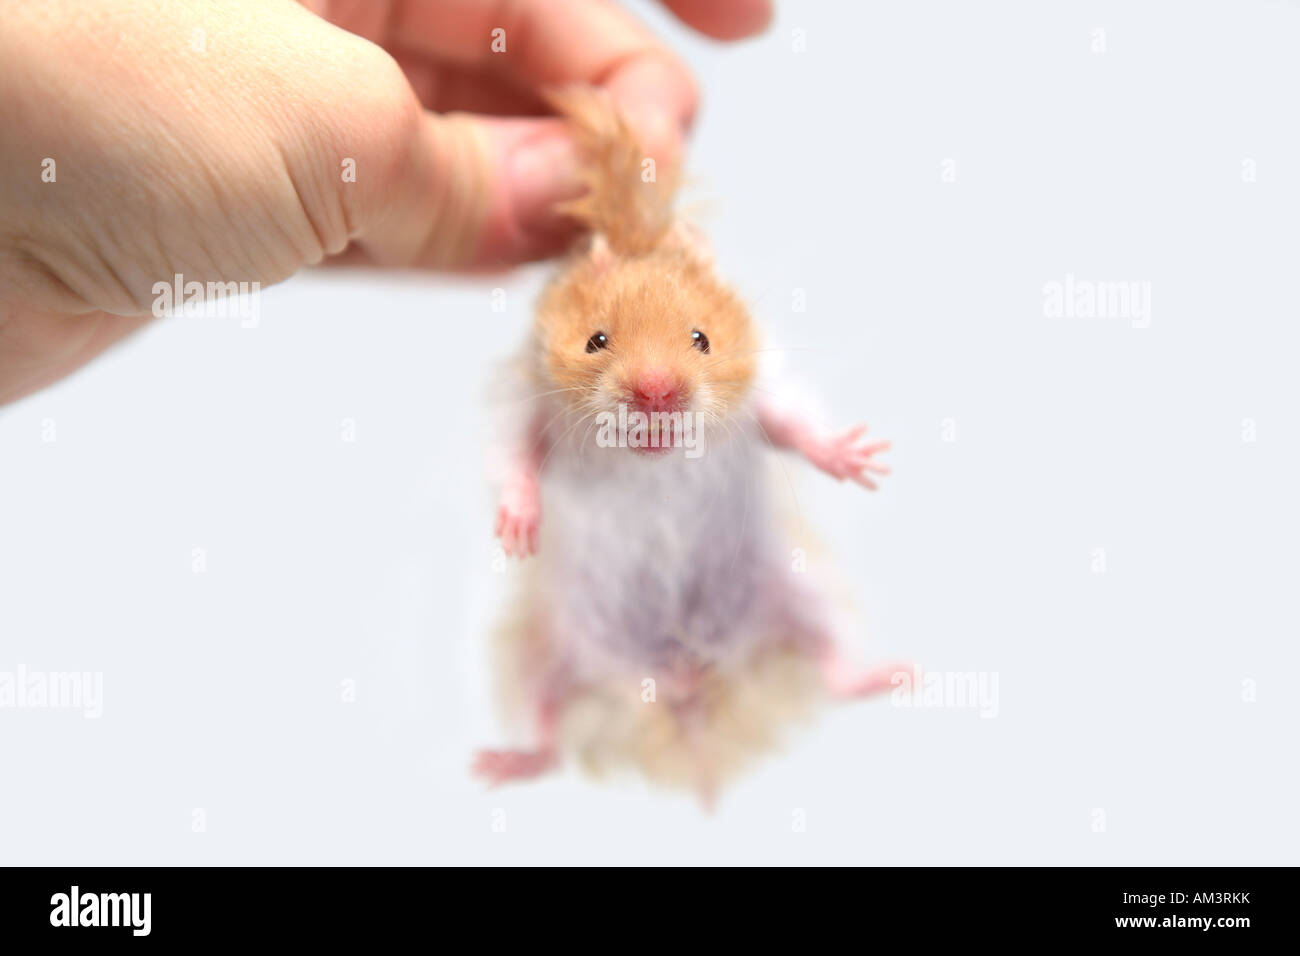 Pet Hamster Teddy Bear Hamster Stock Photos & Pet Hamster